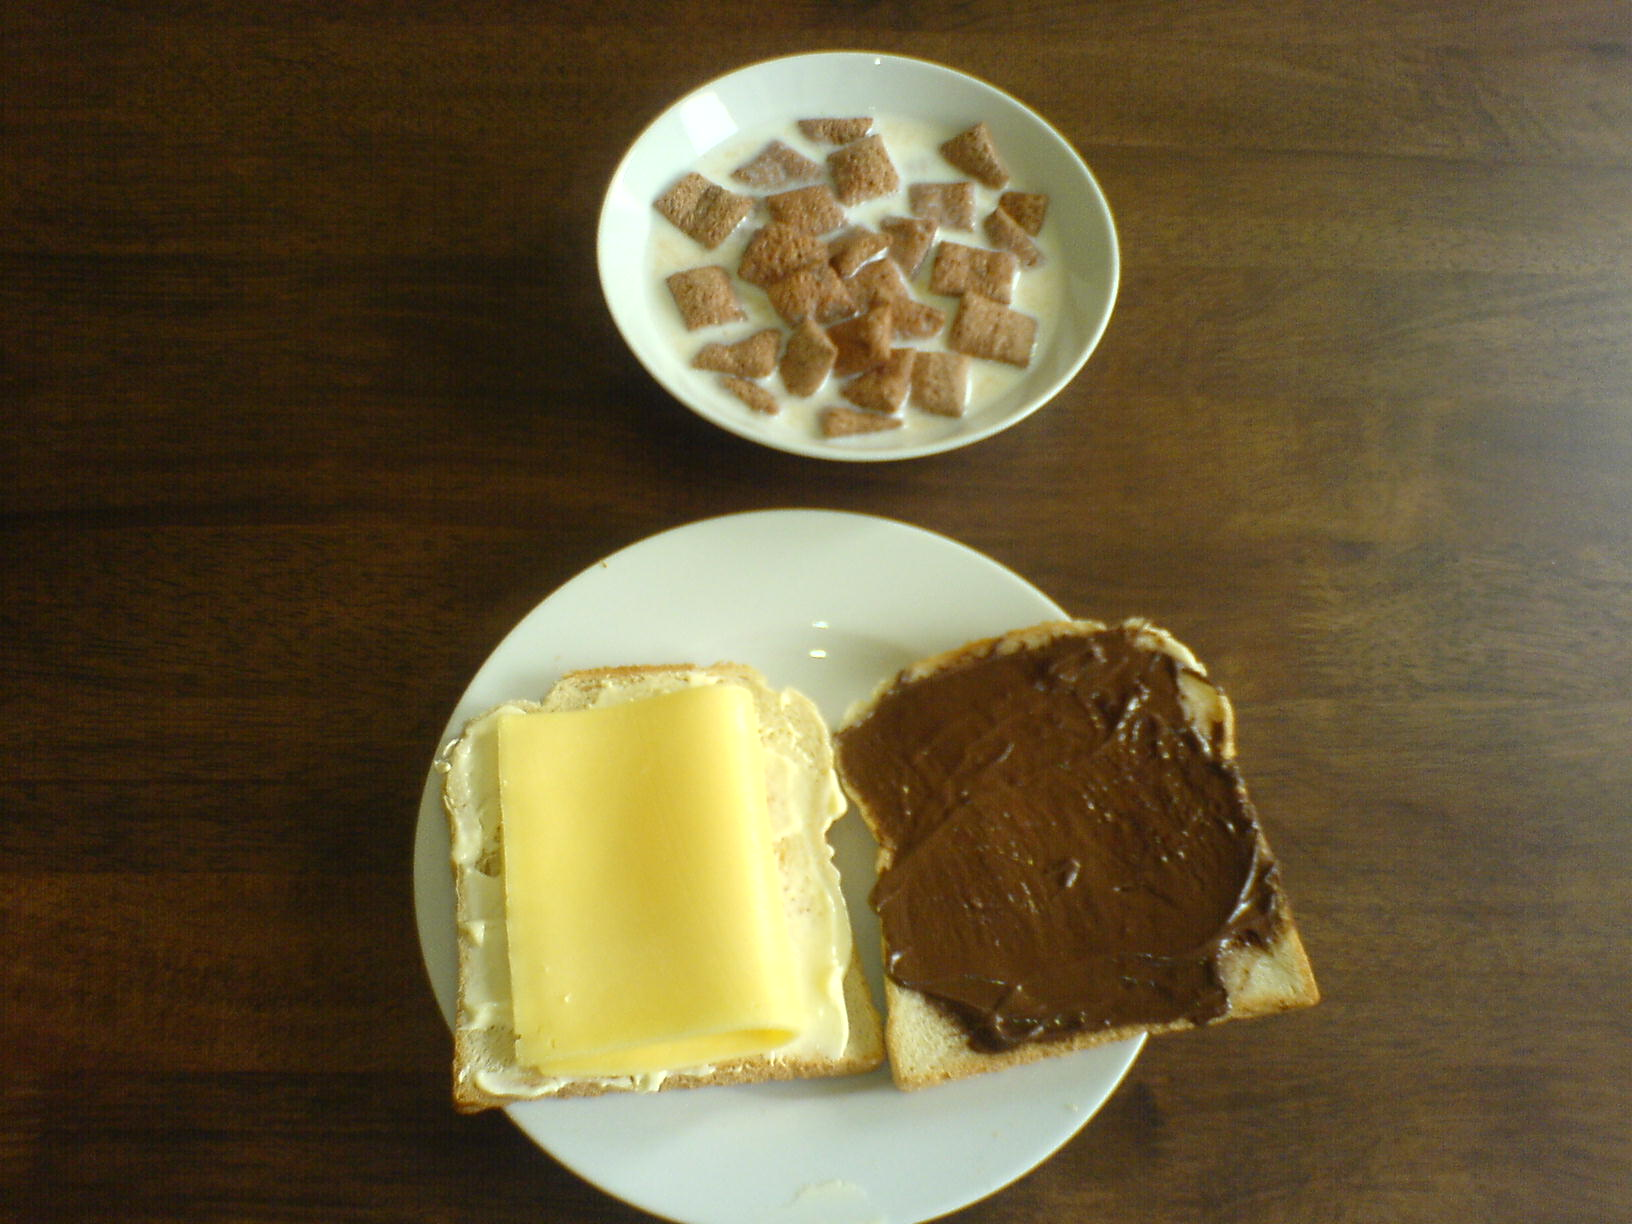 http://foodloader.net/Holz_2010-09-07_Toast-Mix_mit_Kornflakes.jpg